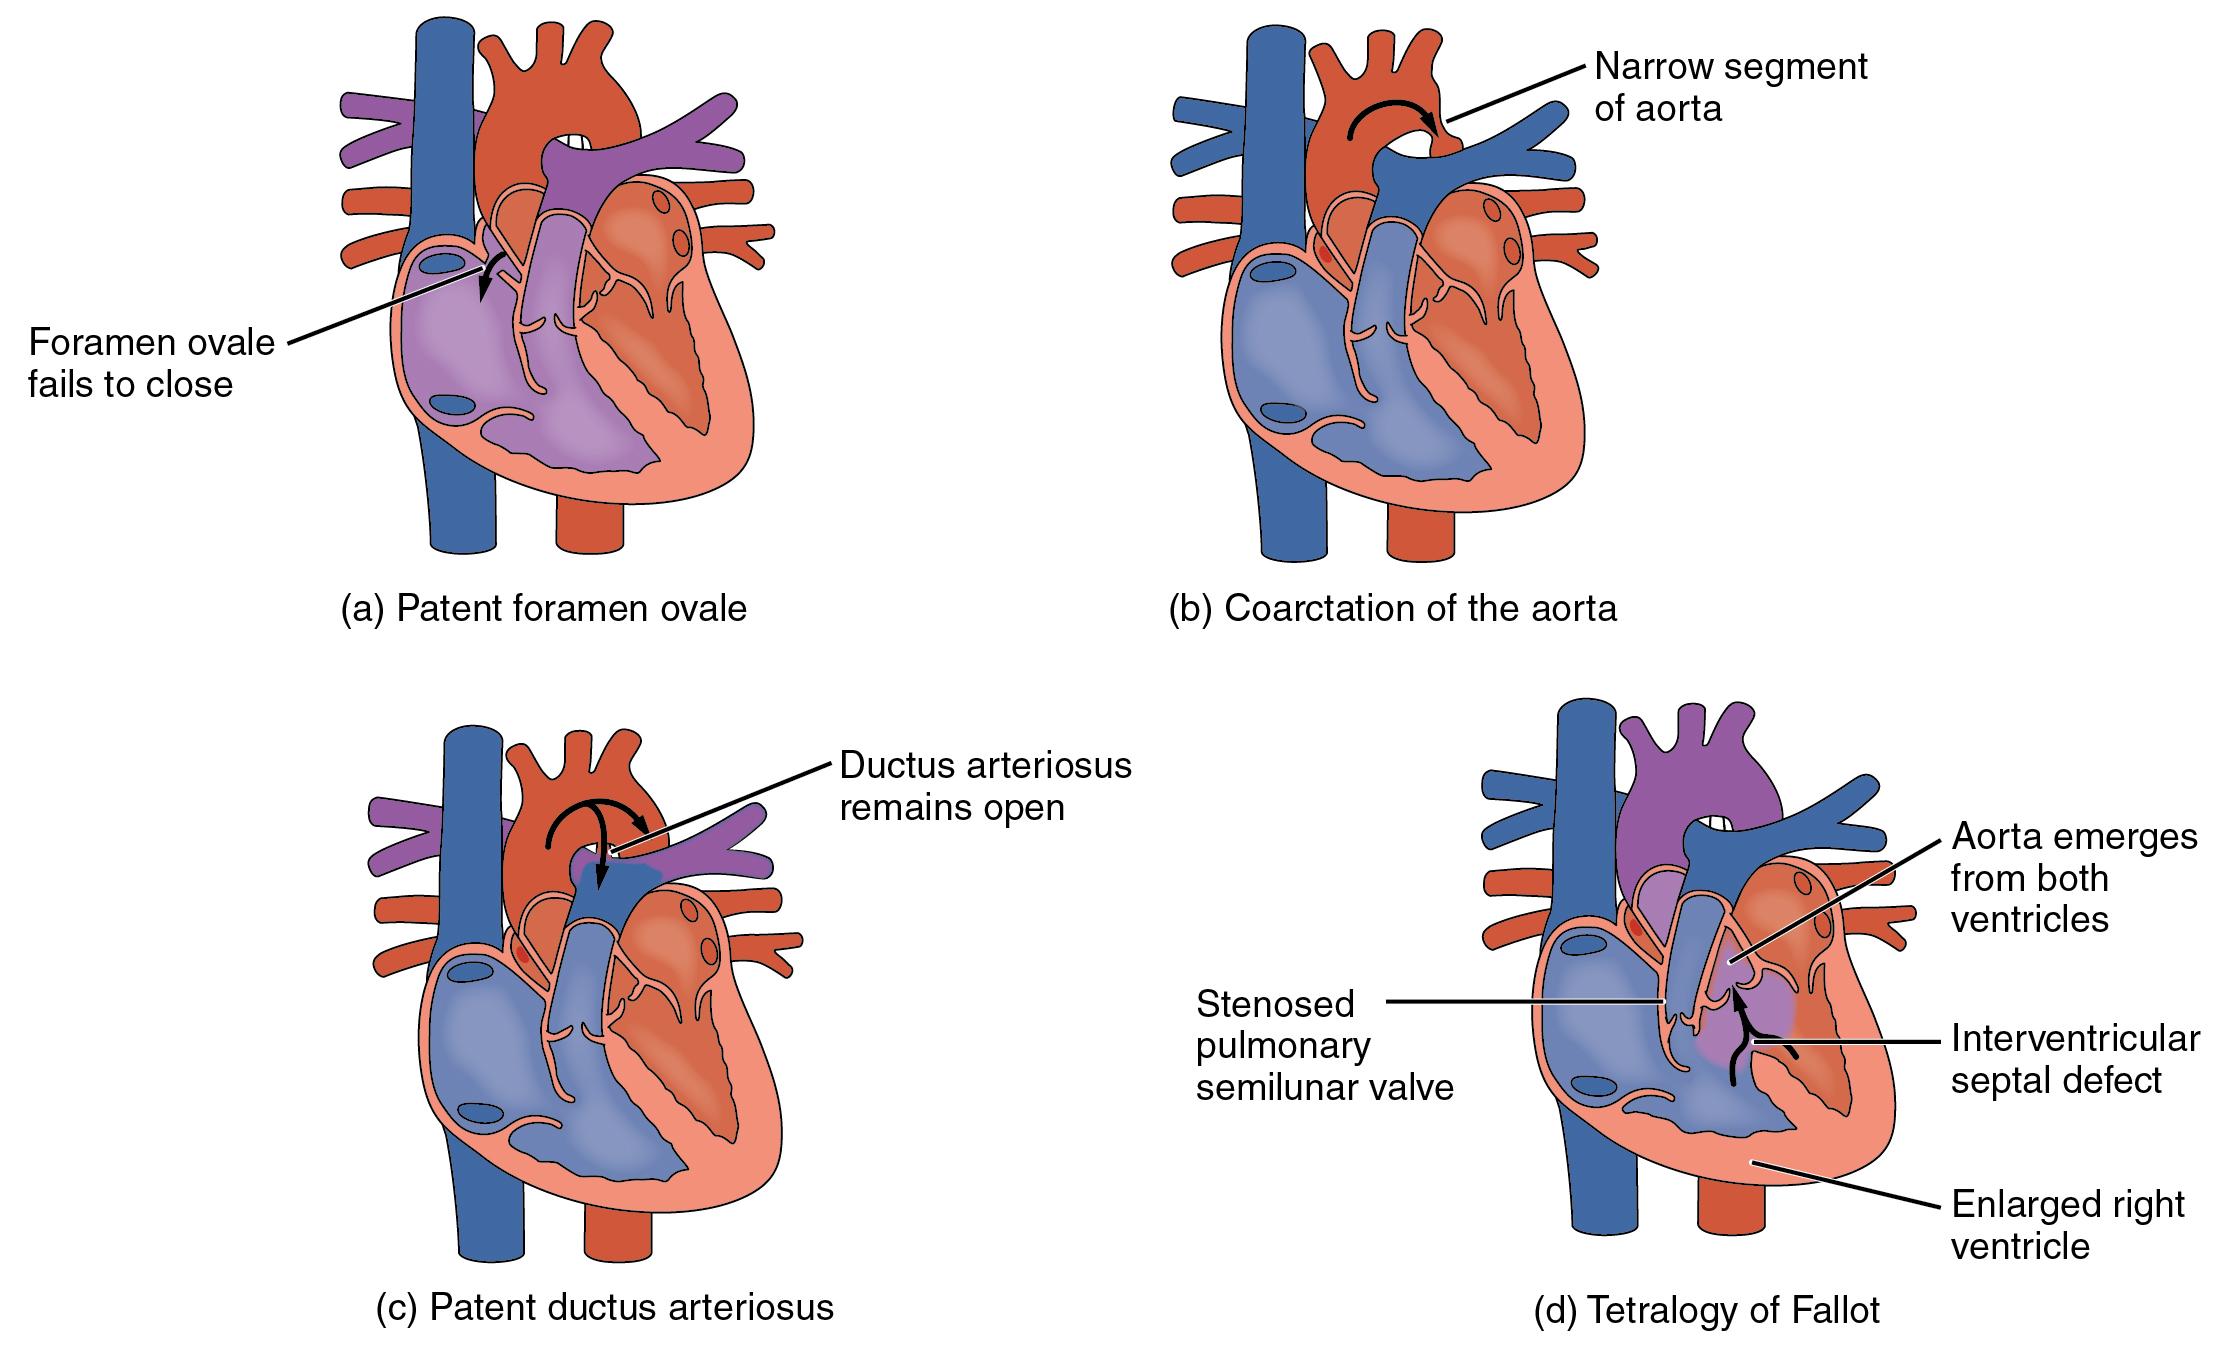 Anatomy and Physiology - Heart Anatomy